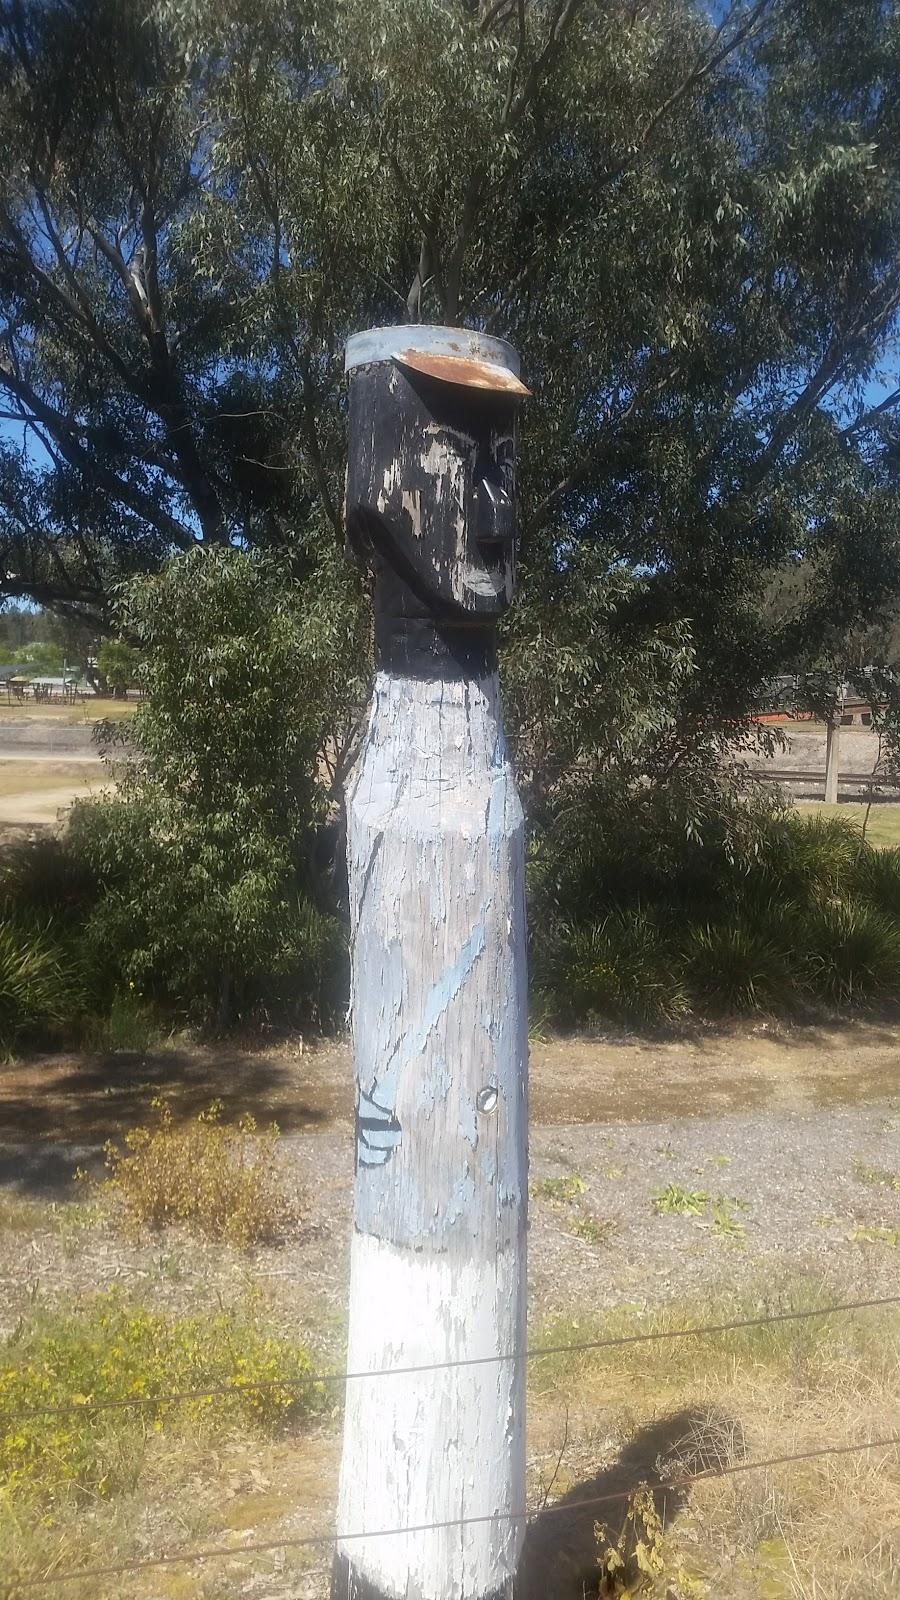 Ned Kelly Museum & Homestead | museum | 35 Gladstone St, Glenrowan VIC 3675, Australia | 0357662448 OR +61 3 5766 2448